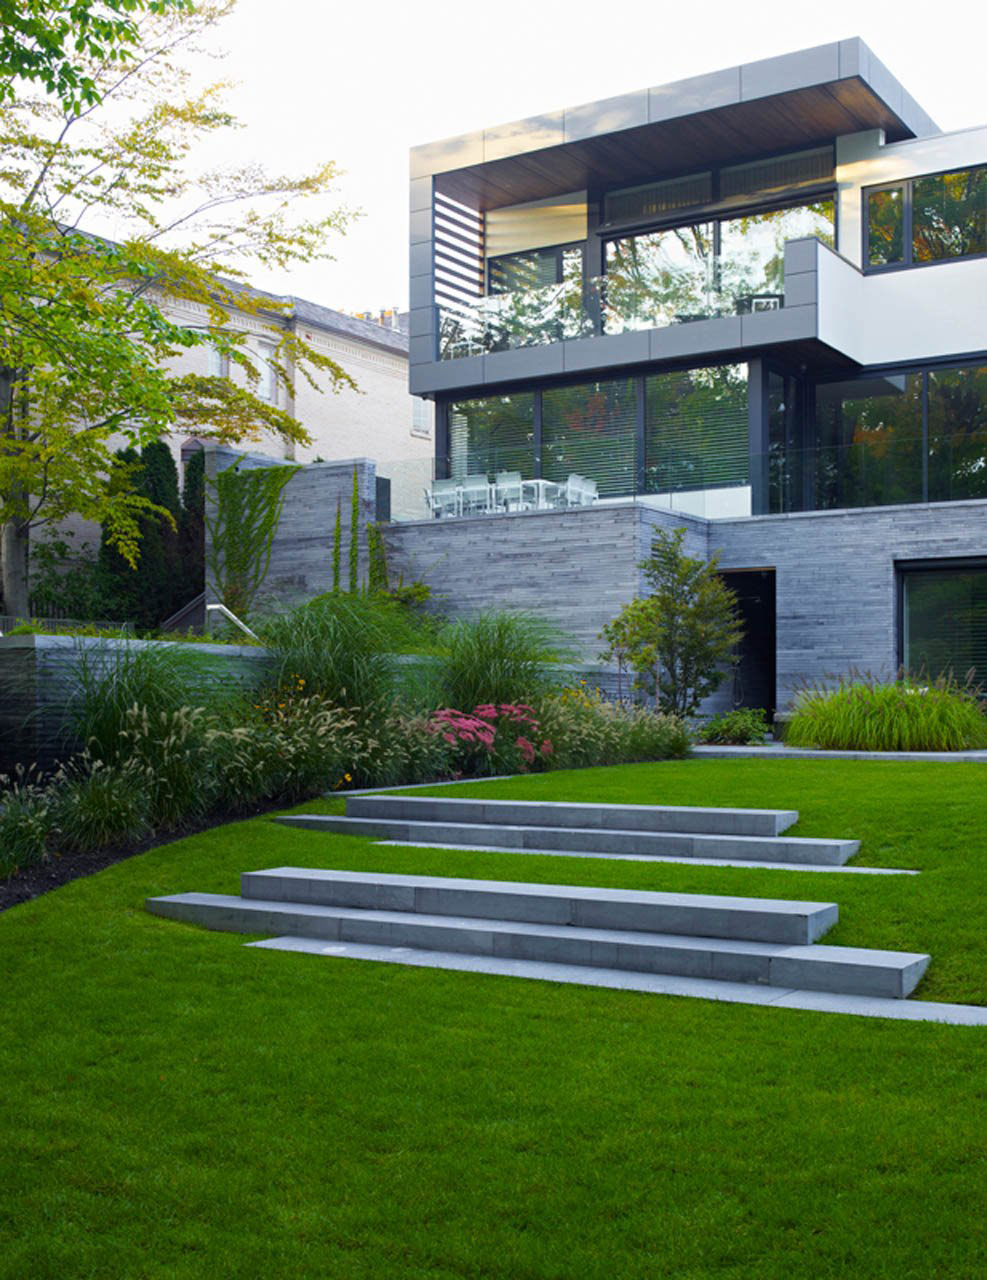 Lawn Steps, Impressive Modern Home in Toronto, Canada